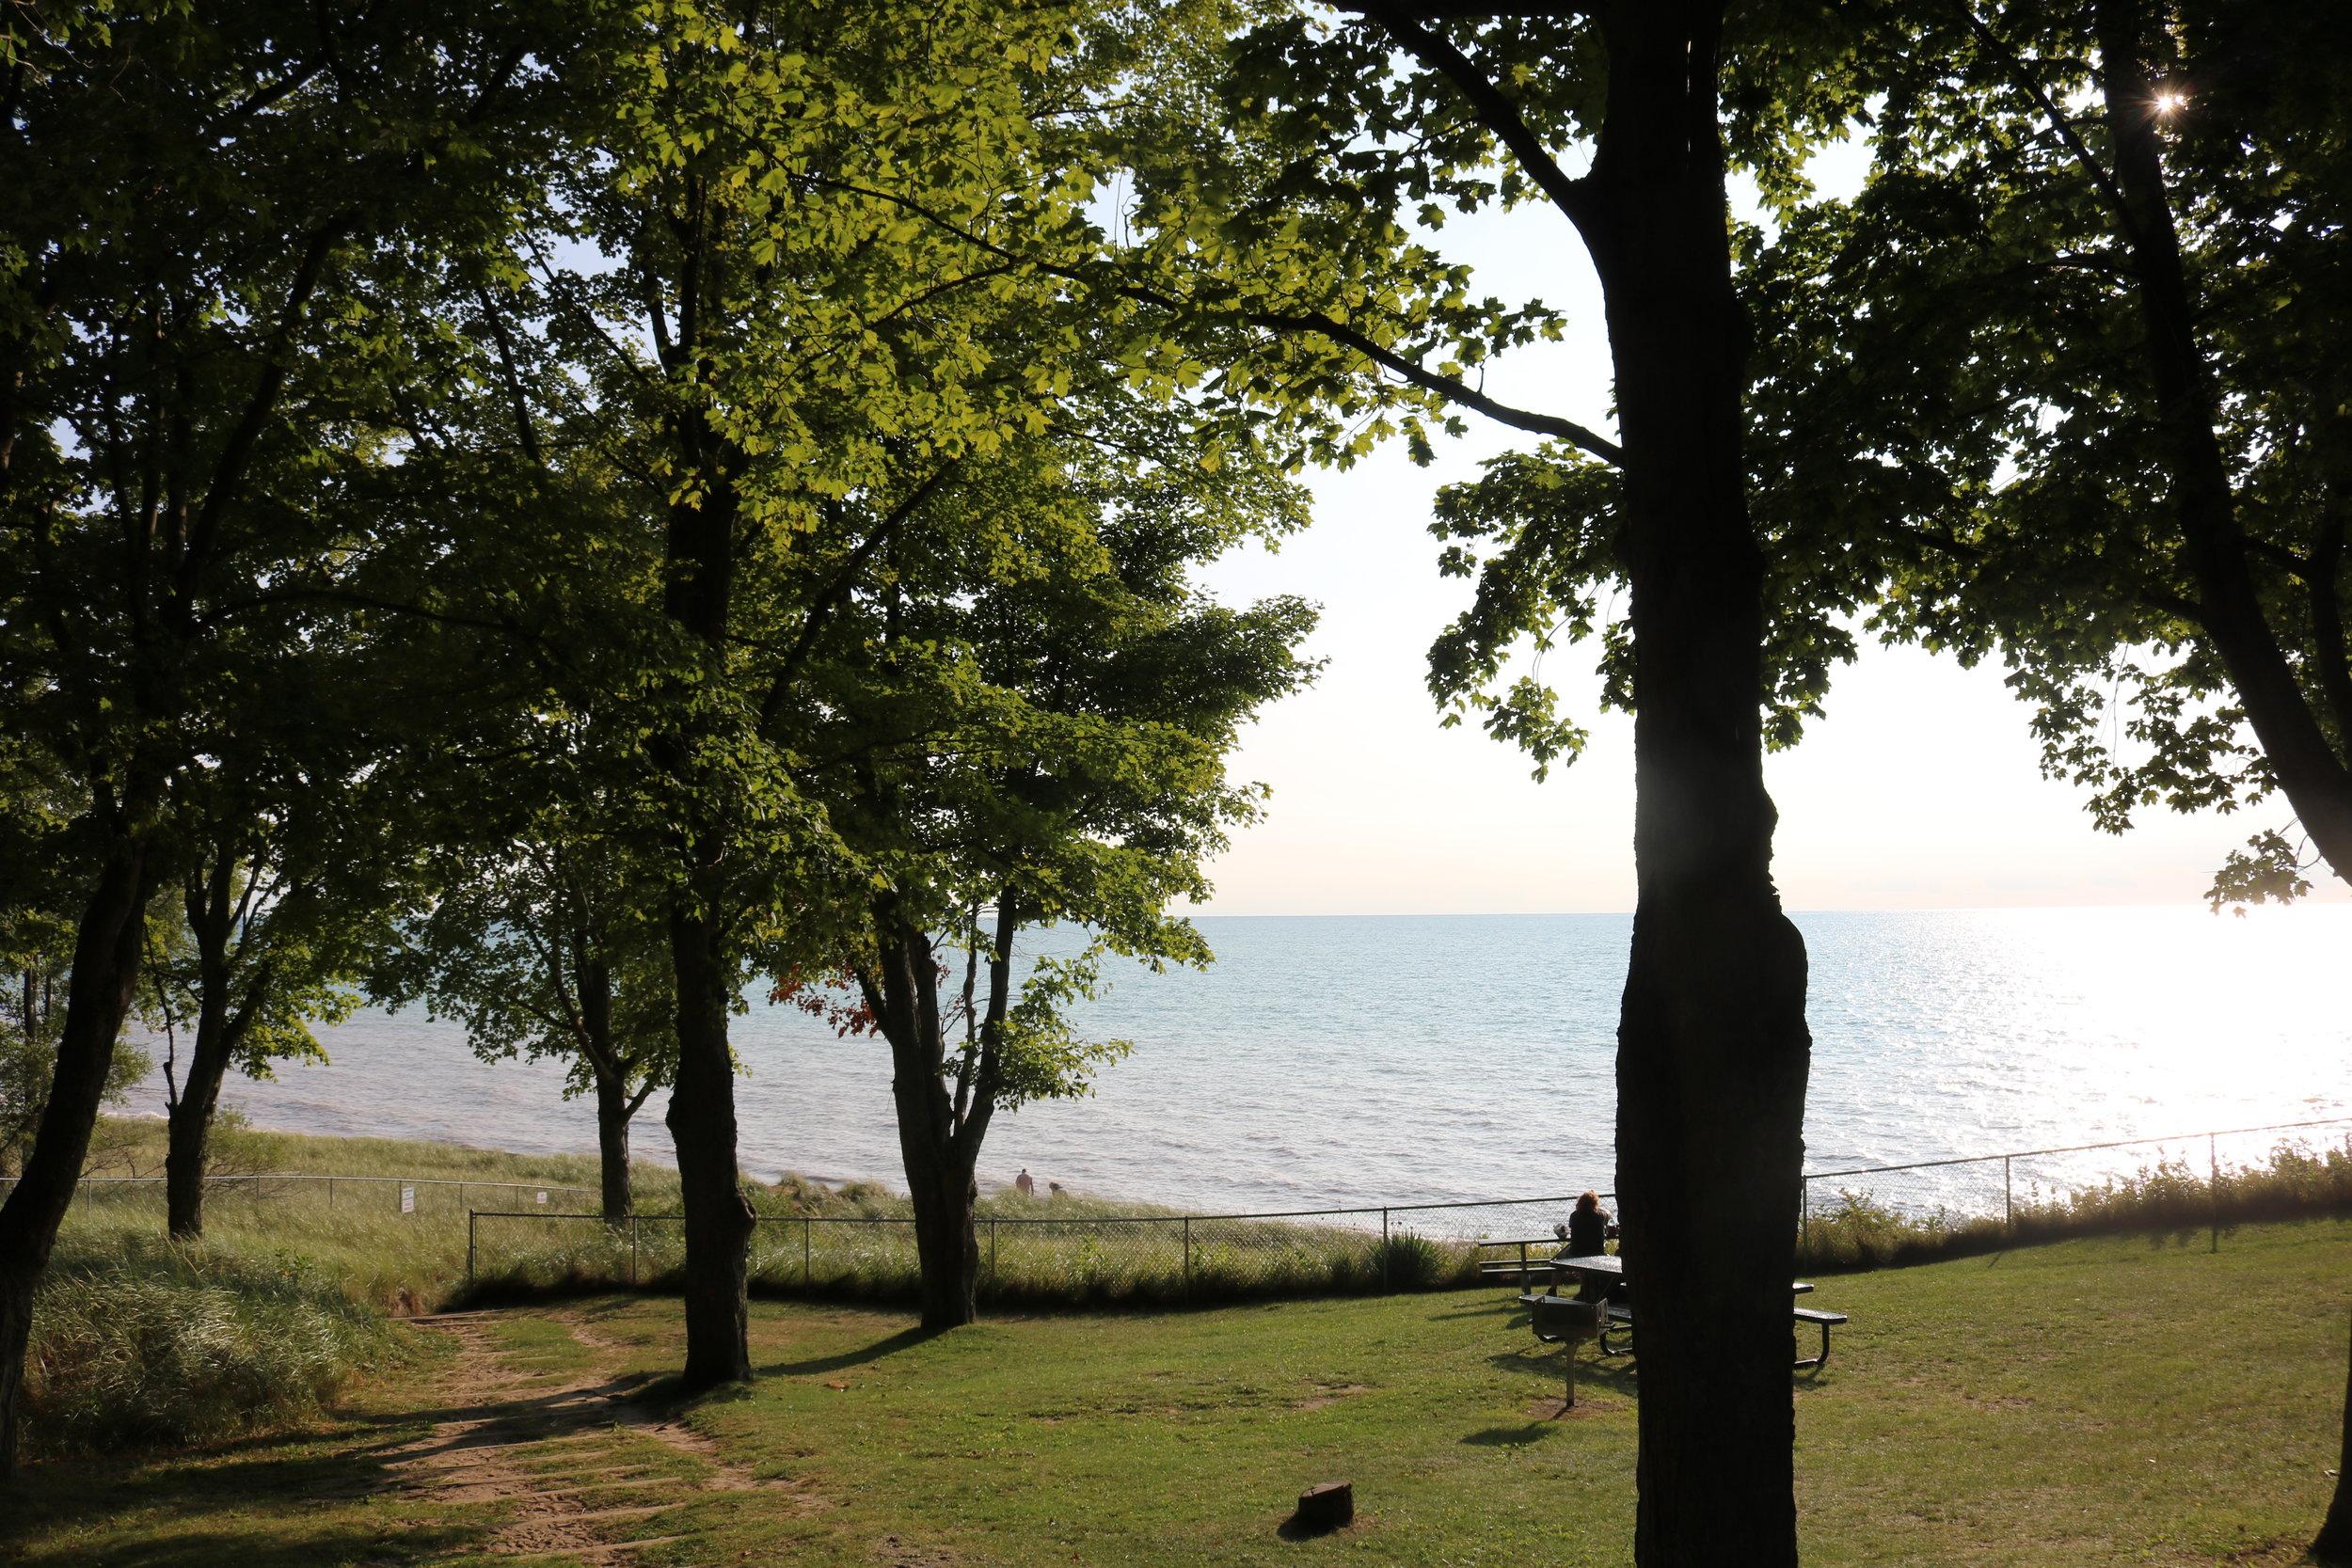 Trees overlook Lake Michigan